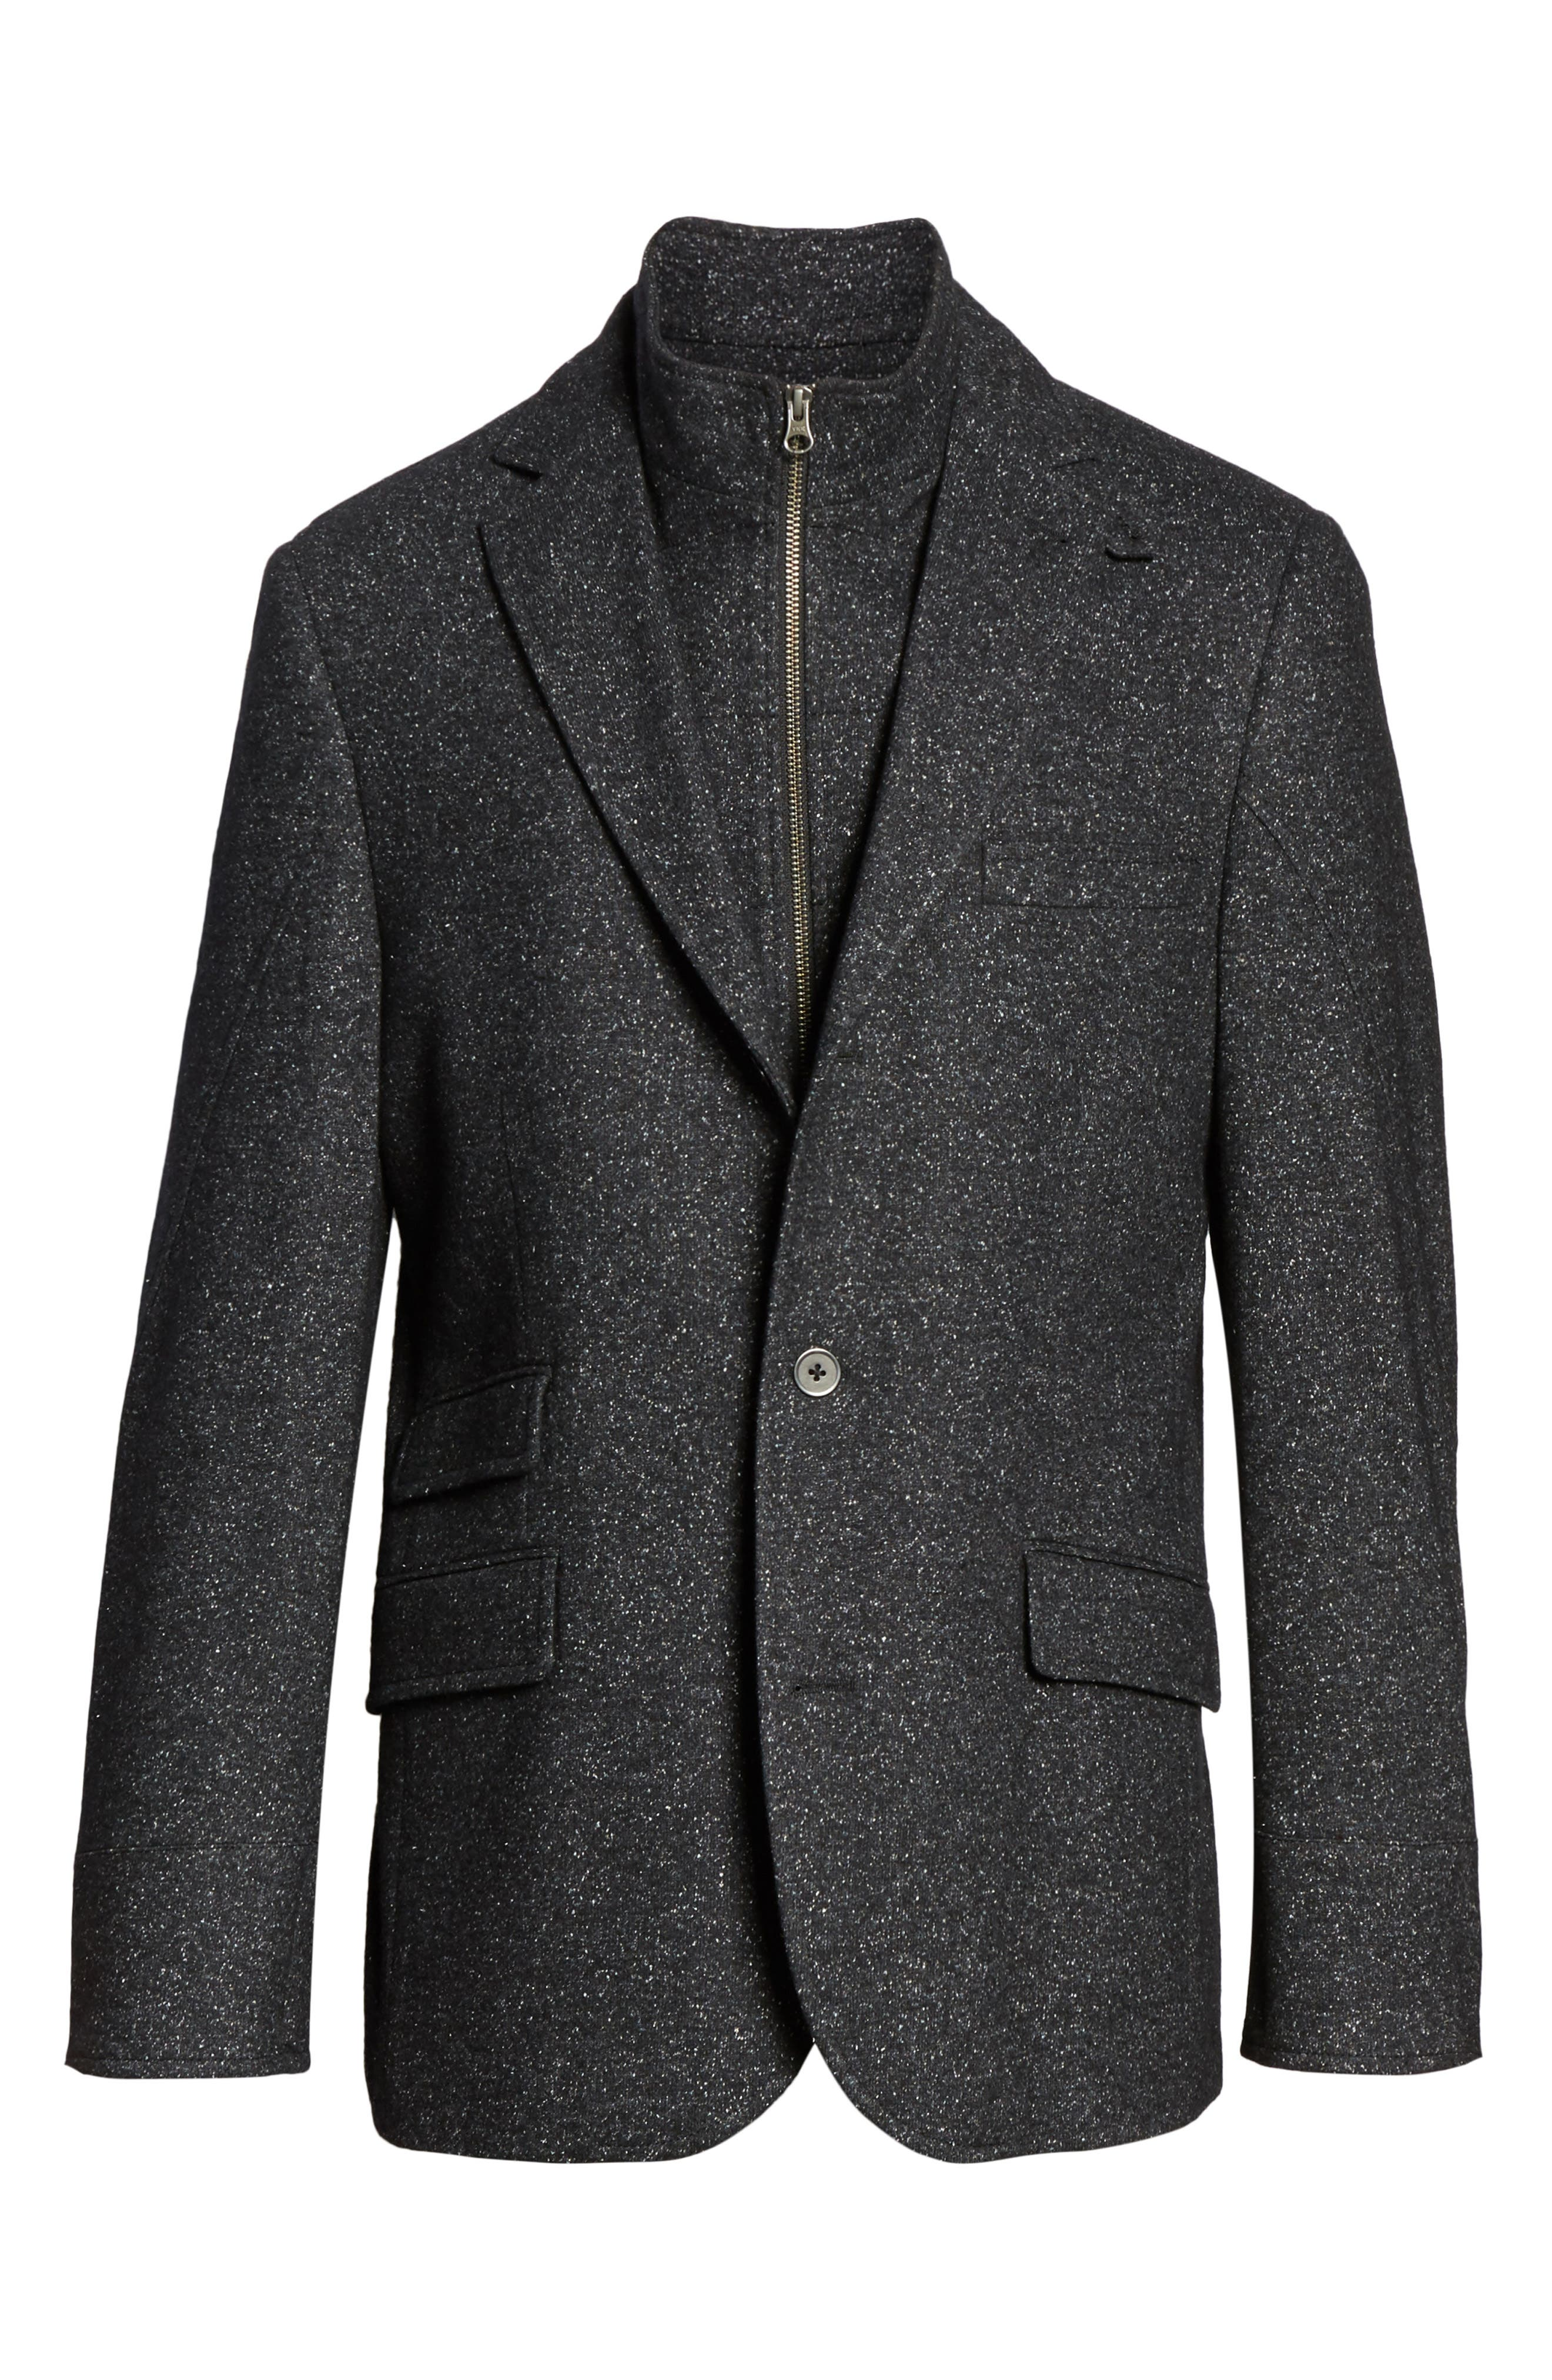 Donegal Wool Blend Hybrid Coat,                             Alternate thumbnail 5, color,                             021